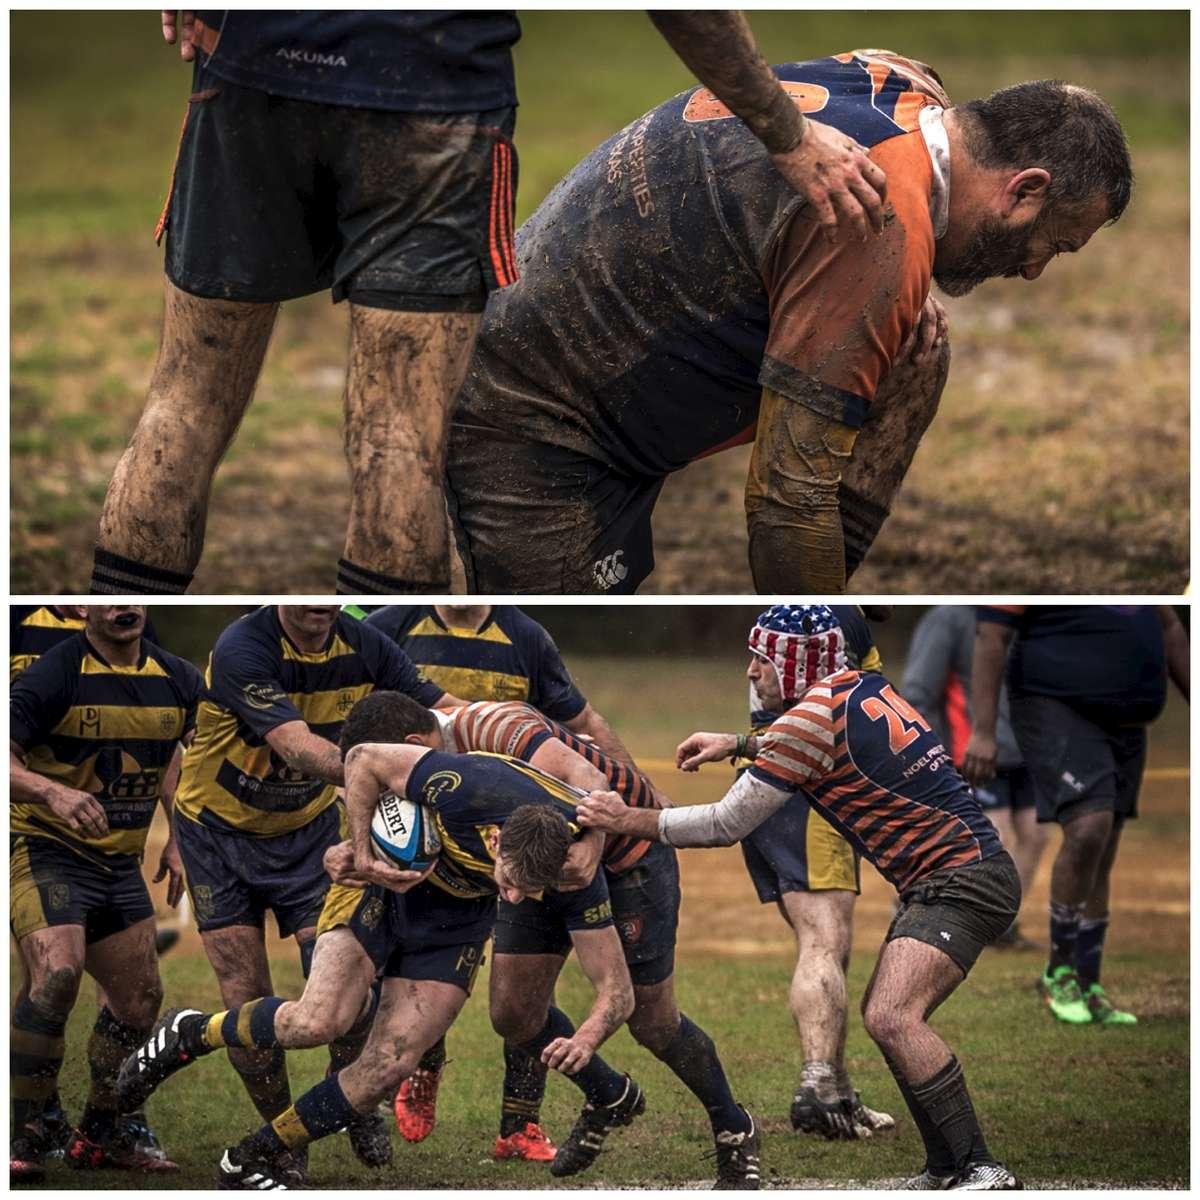 Harben_rugbyduo